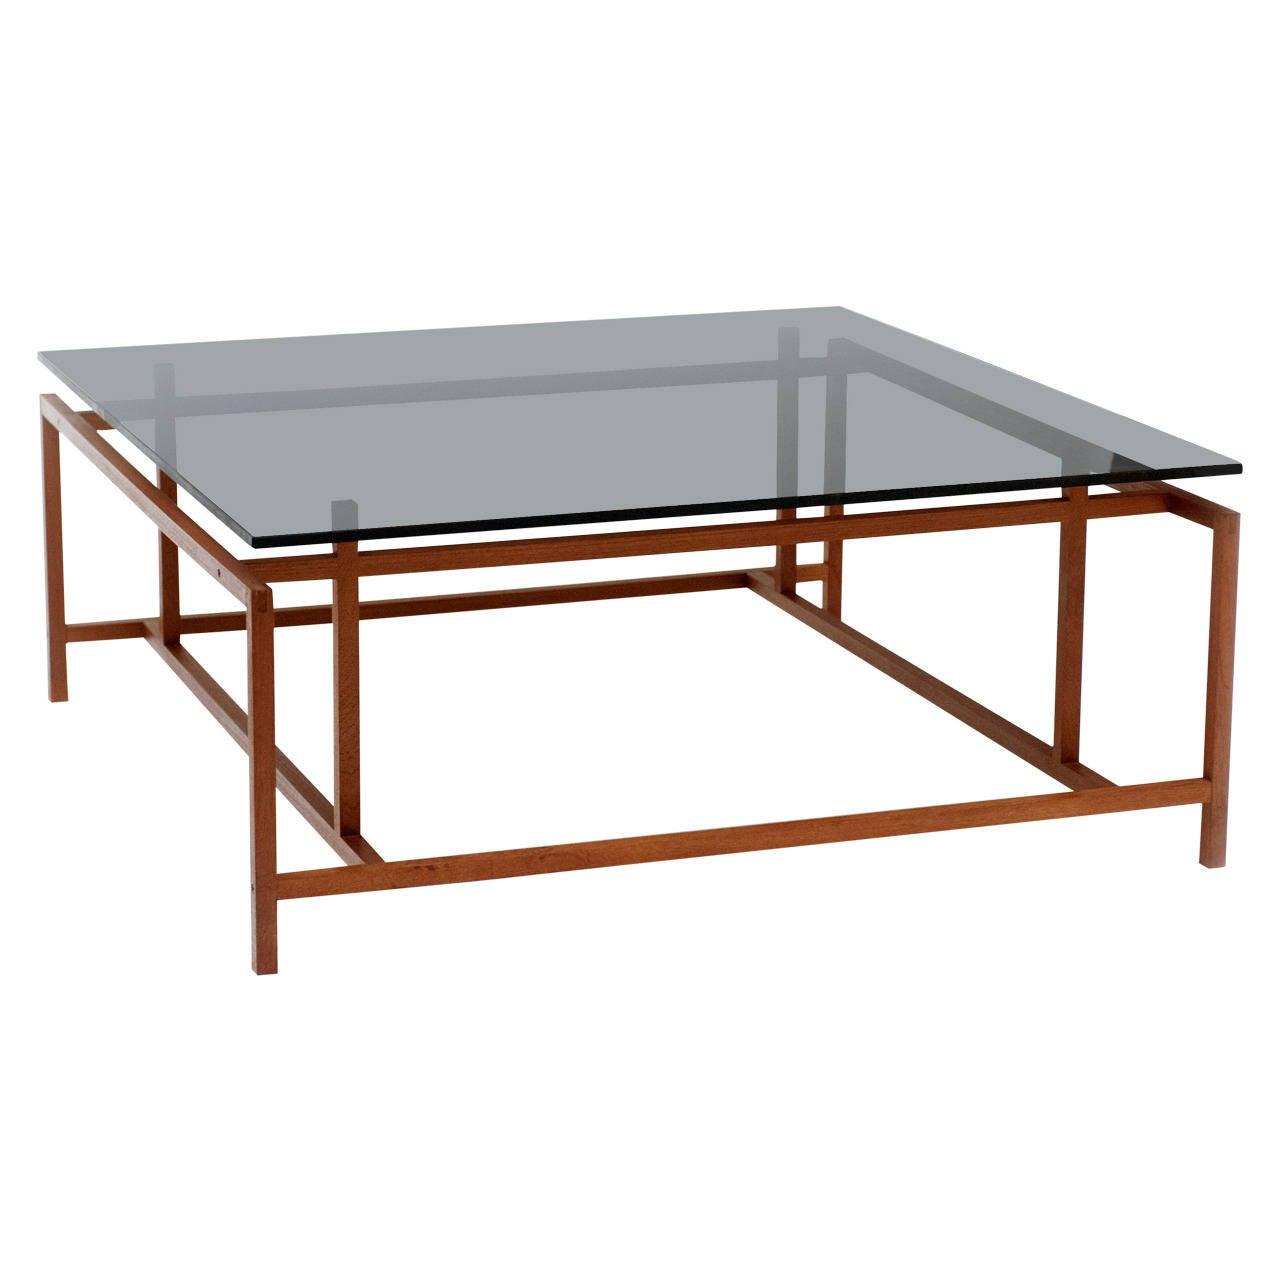 Danish modern komfort teak glass coffee table by henning for Designer cocktail tables glass